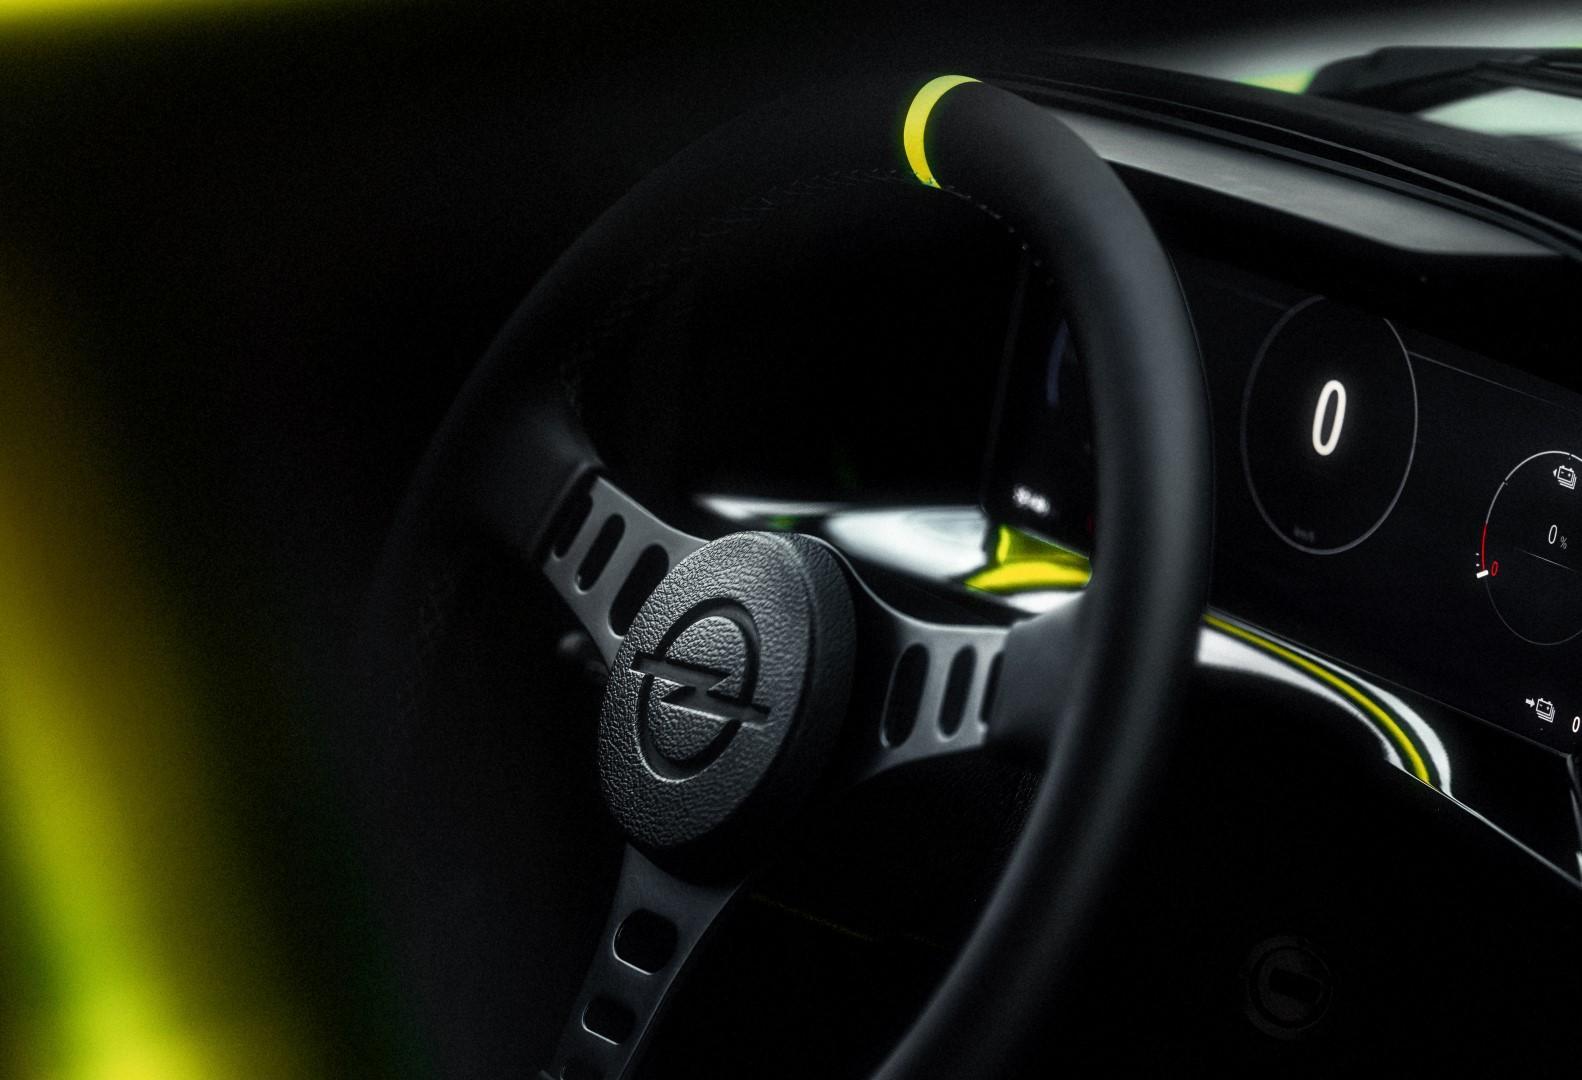 17_Opel-Manta-GSe-ElektroMOD-515670 (Large).jpg